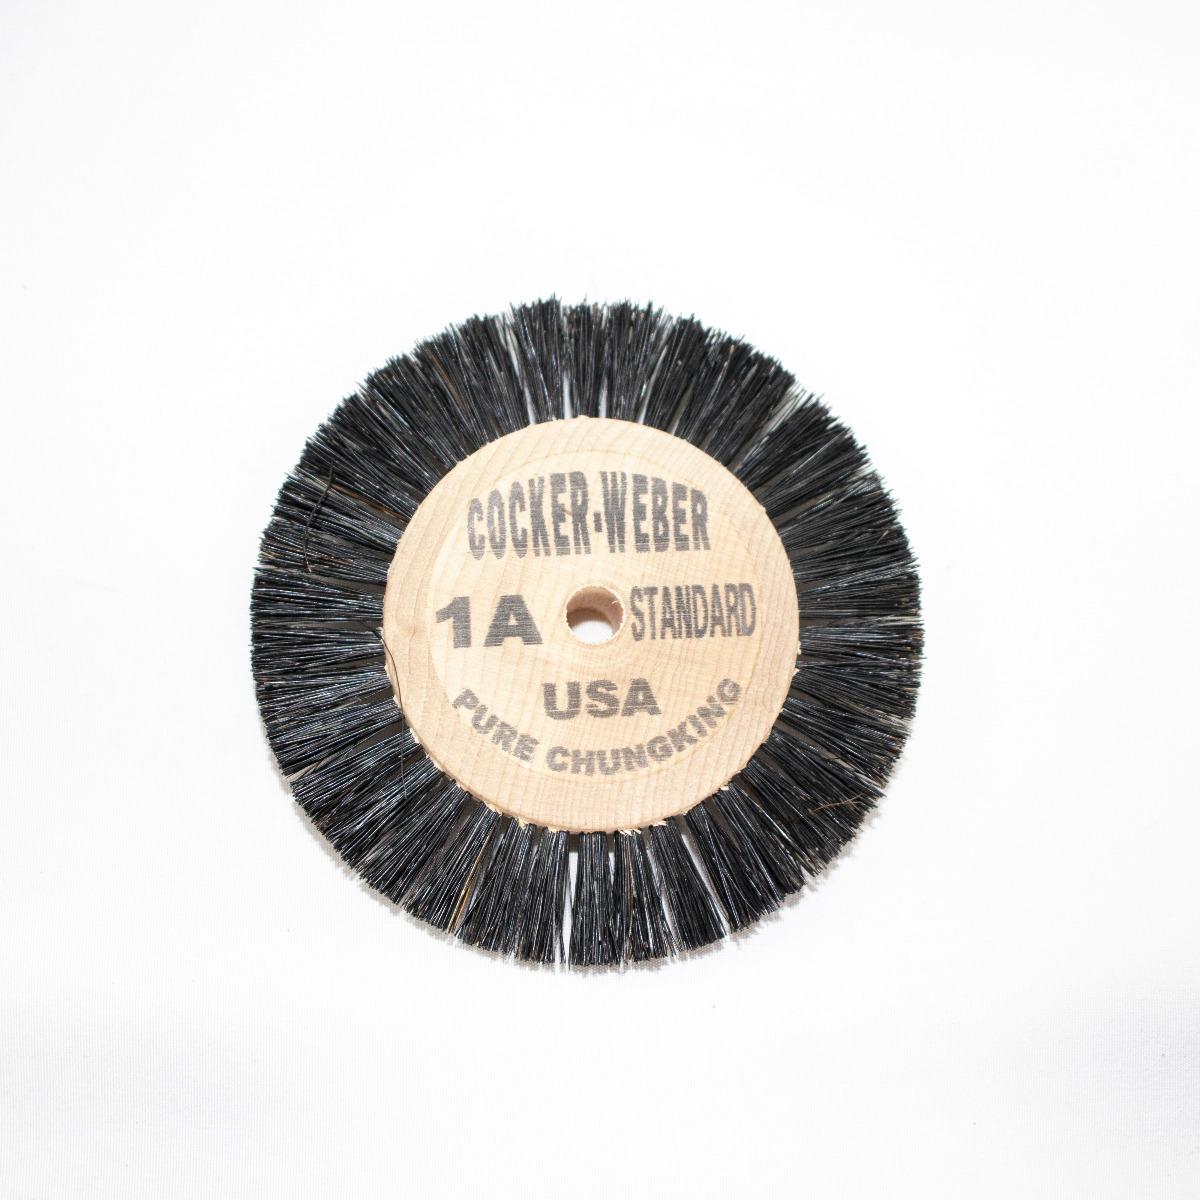 "1A Green Label Cocker Weber Brush, 5/8"" Trim Hair"